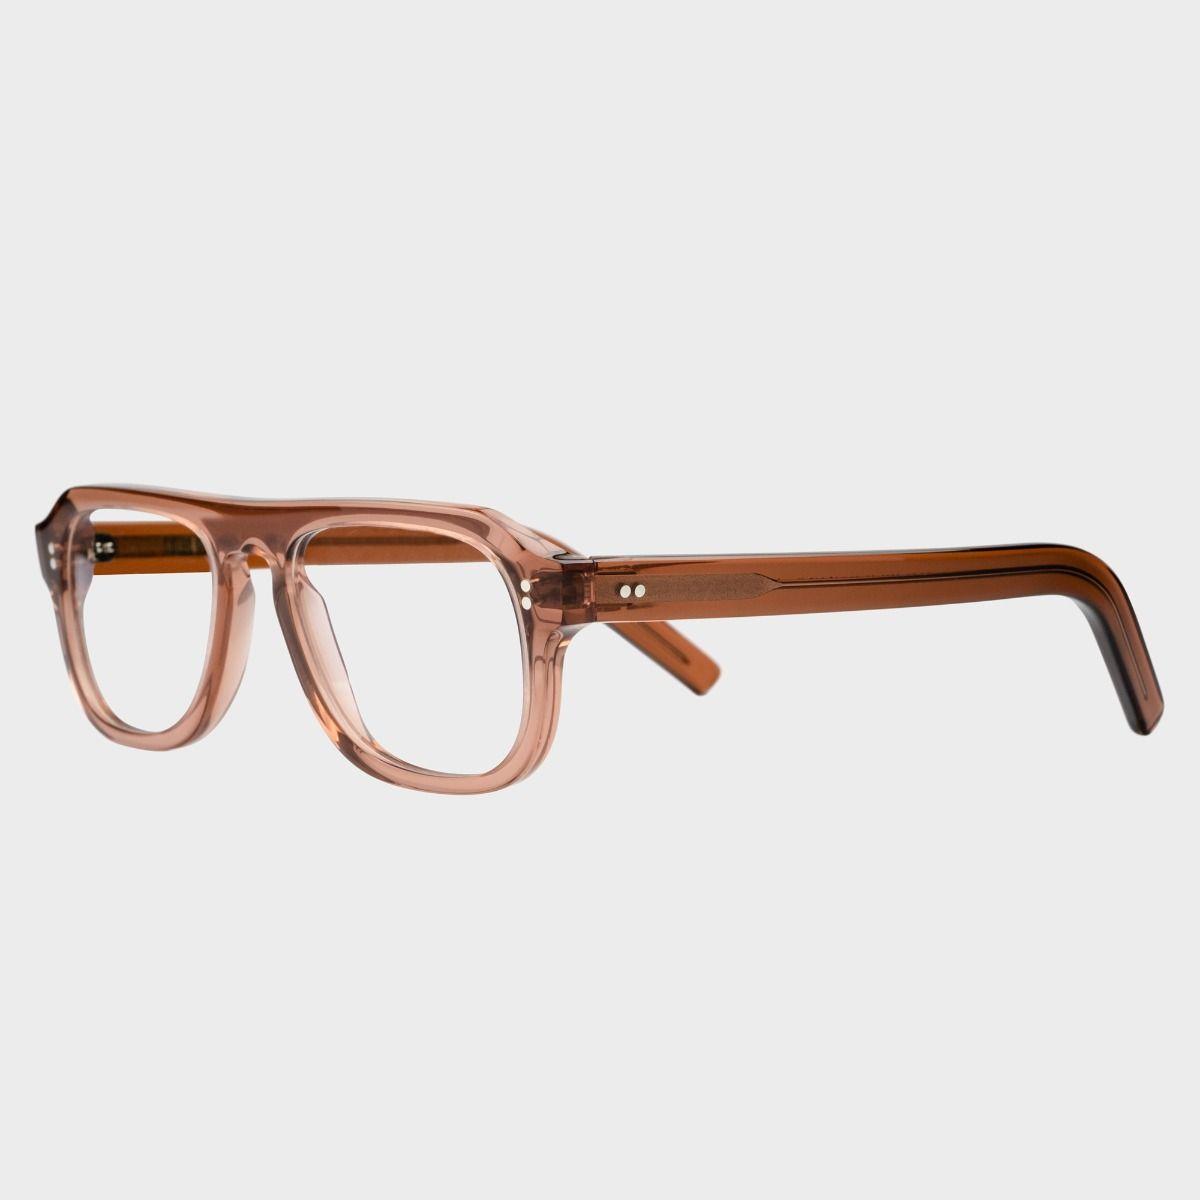 0822 Optical Aviator Glasses-Rhubarb